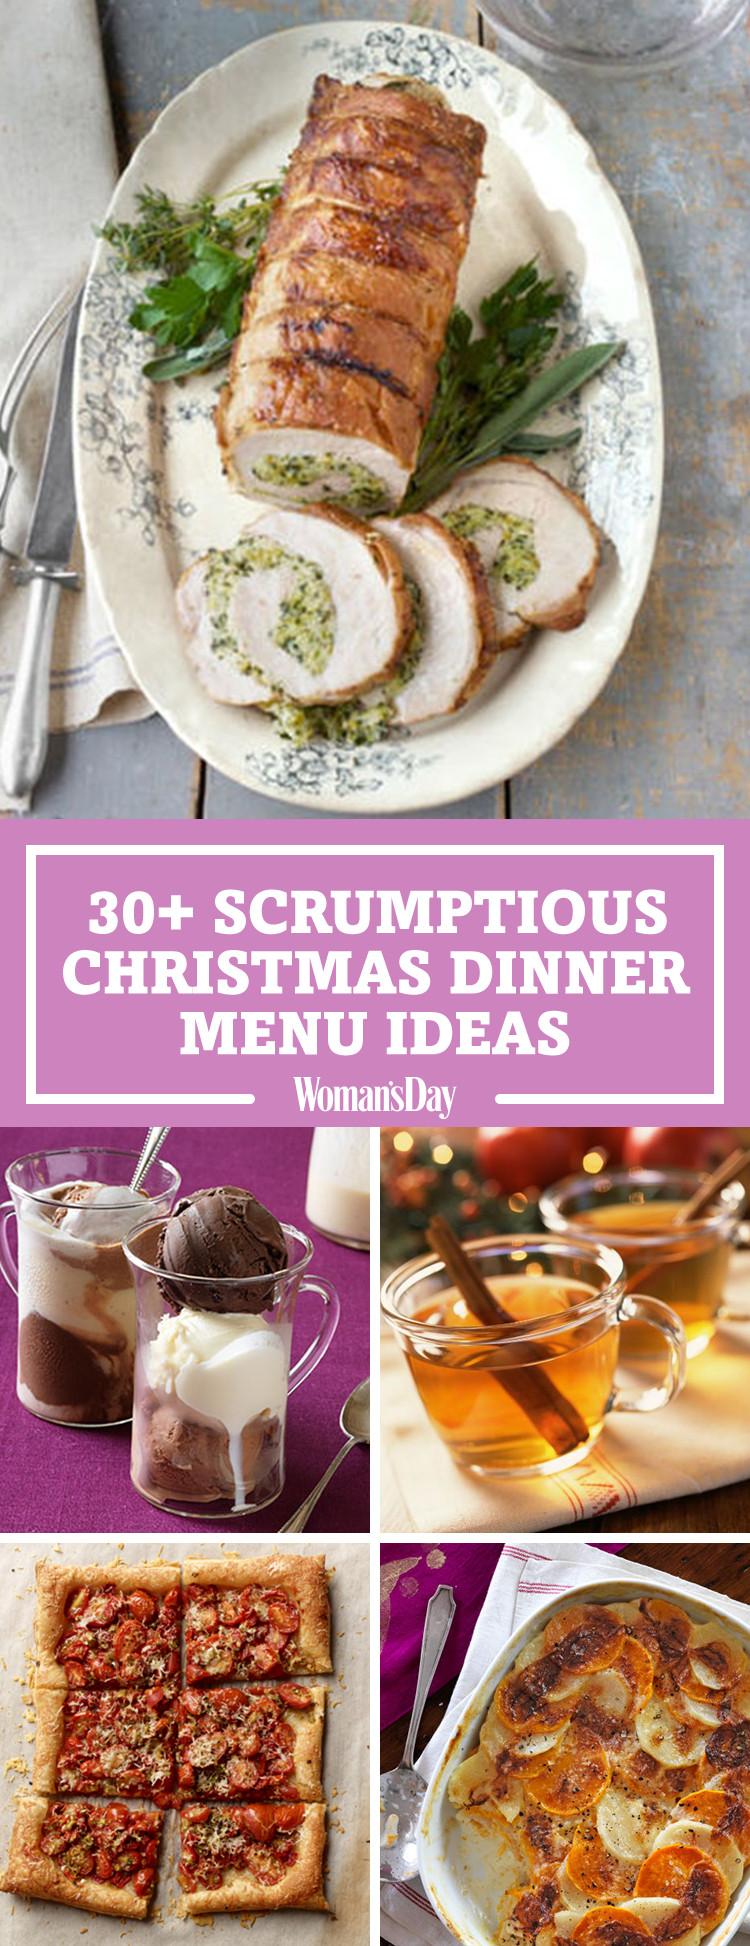 Christmas Dinner Ideas 2017  Best Christmas Dinner Menu Ideas for 2017